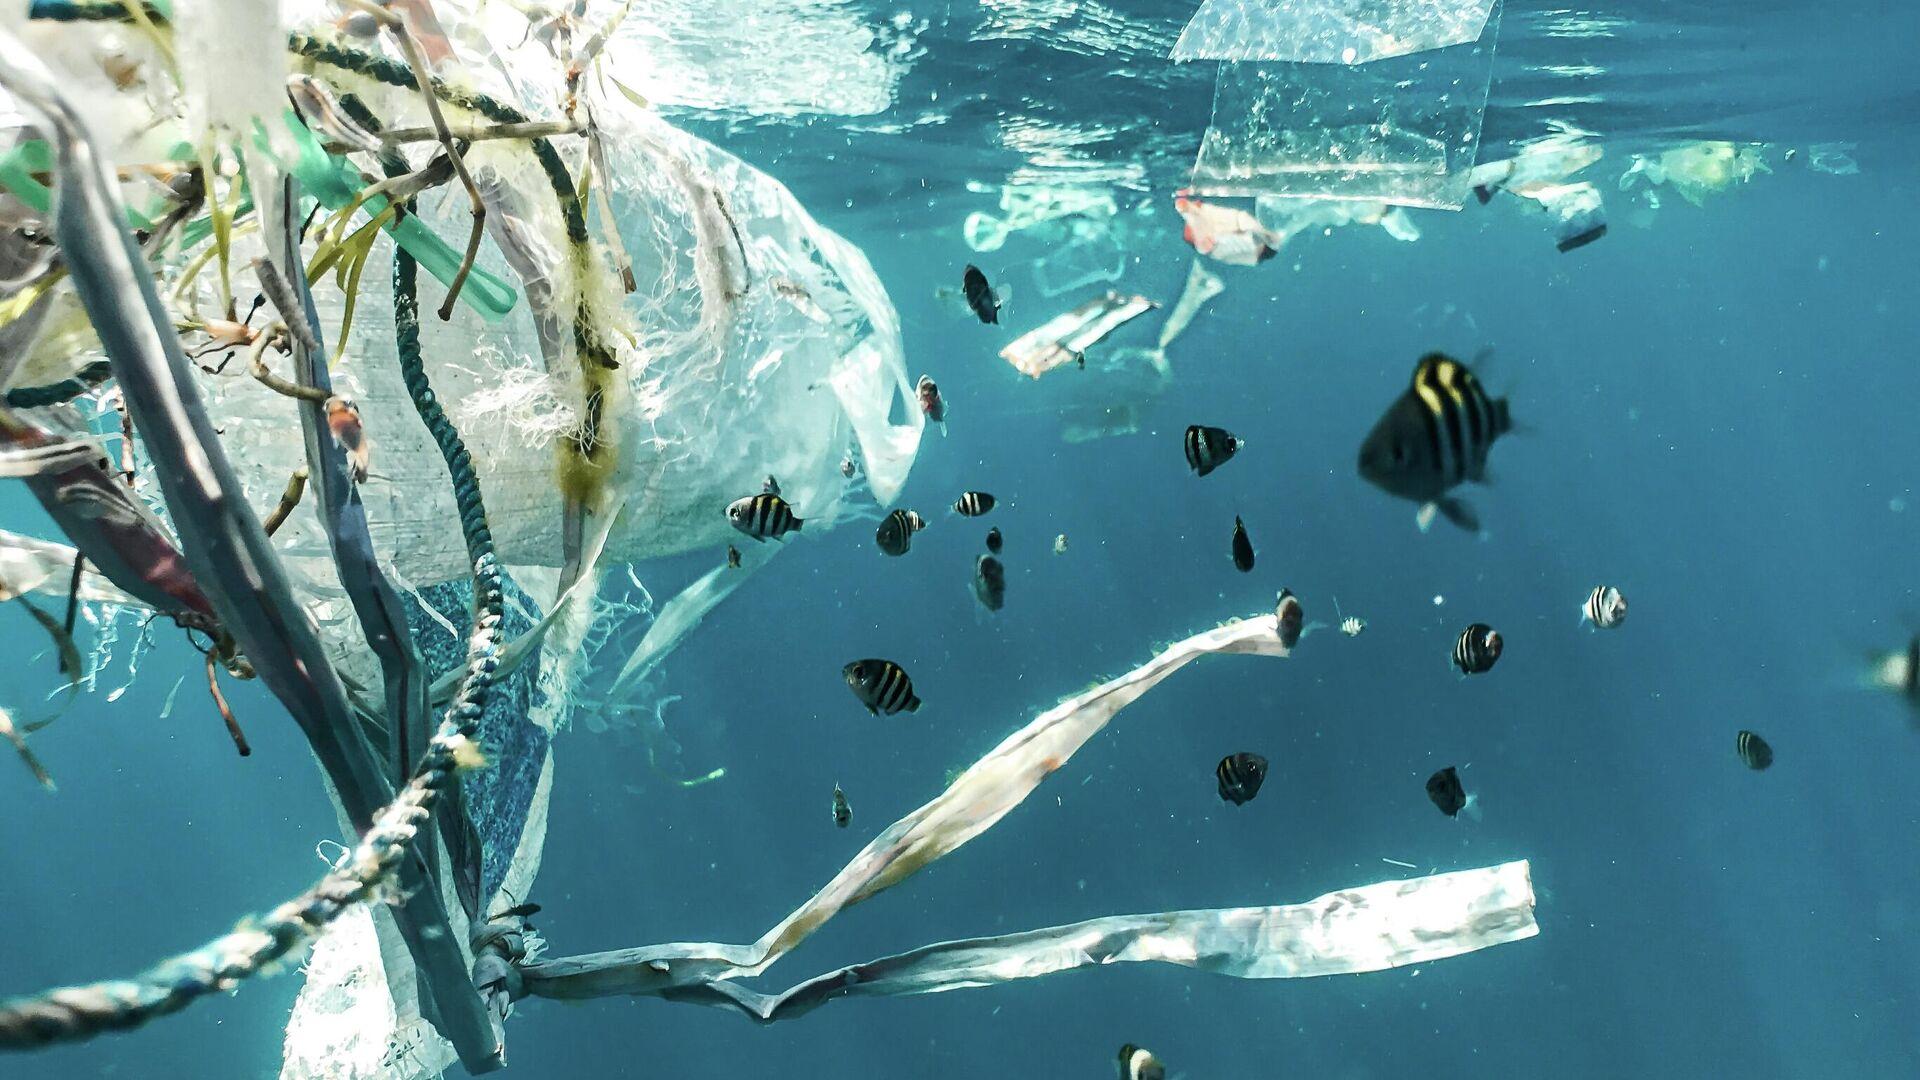 Plastic pollution and juvenile fish. - Sputnik Mundo, 1920, 16.06.2021